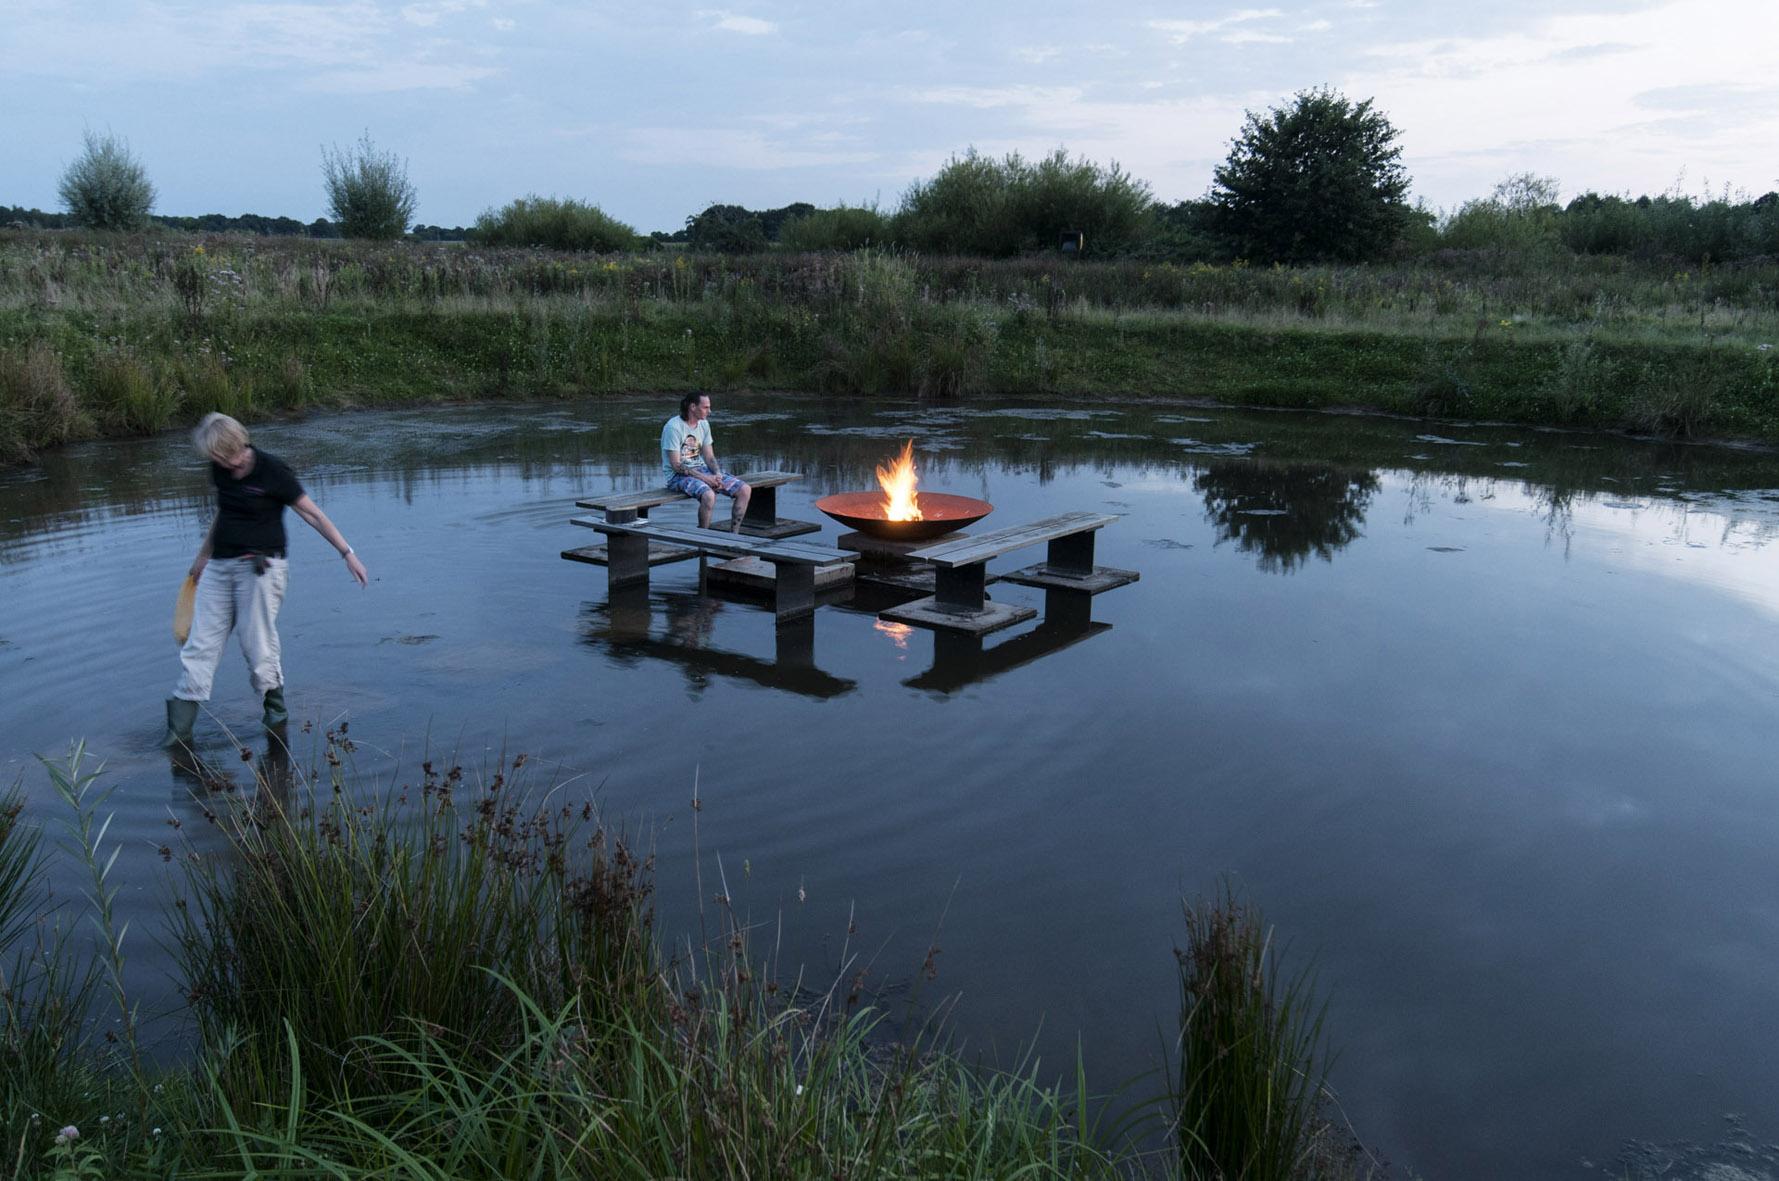 Nederland, Hardenberg, 26-8-2016 Vechtpark Foto: Ton van Vliet/Terborg